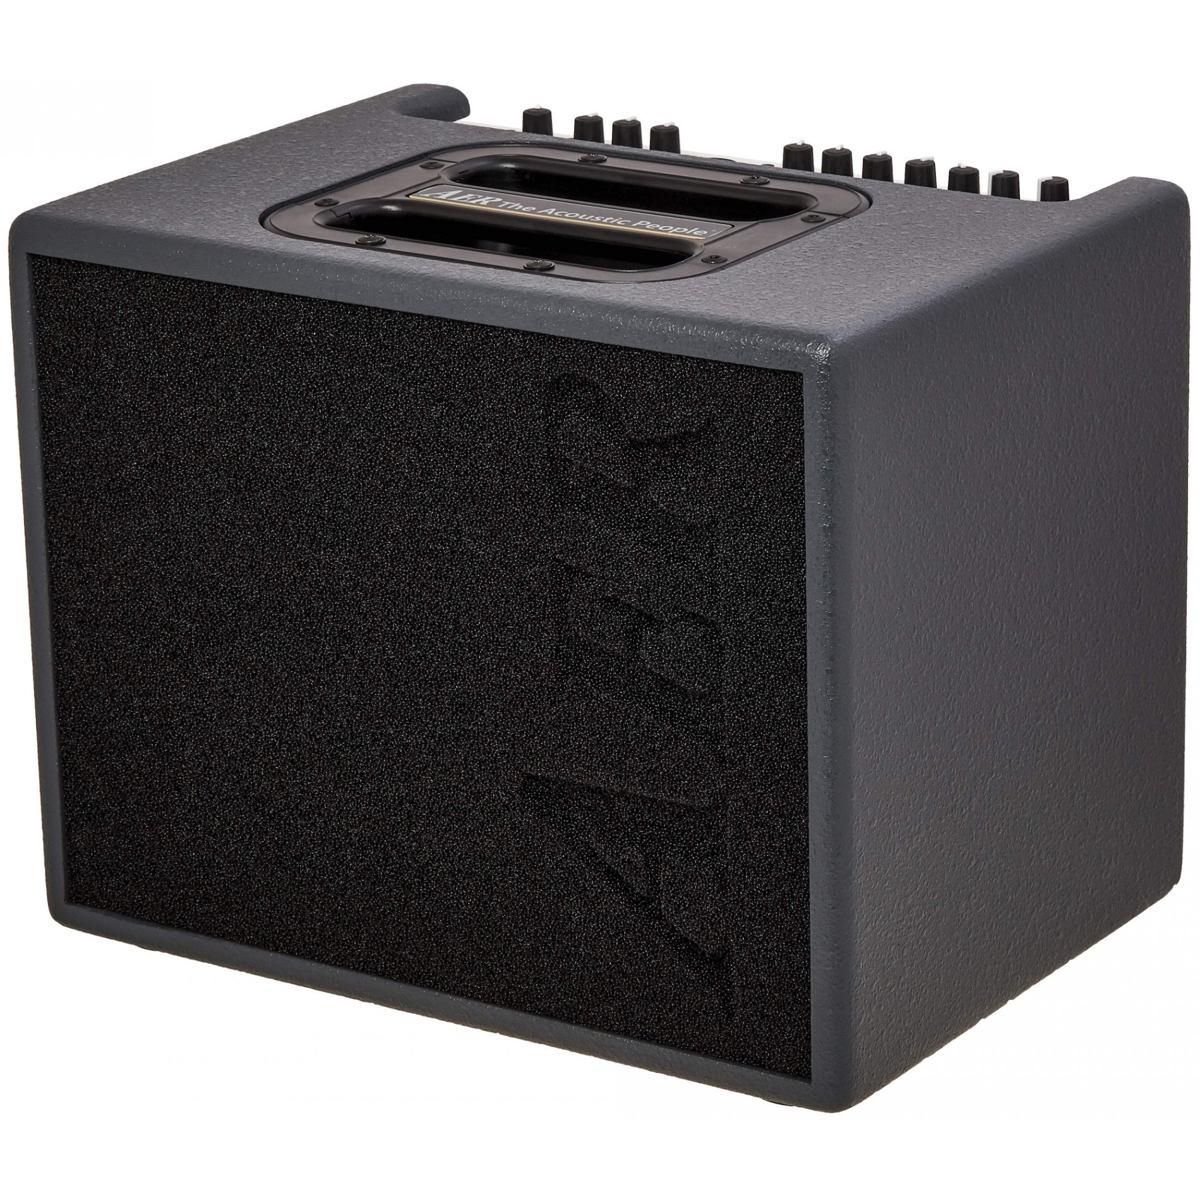 AER Compact 60 IV Barva: šedá